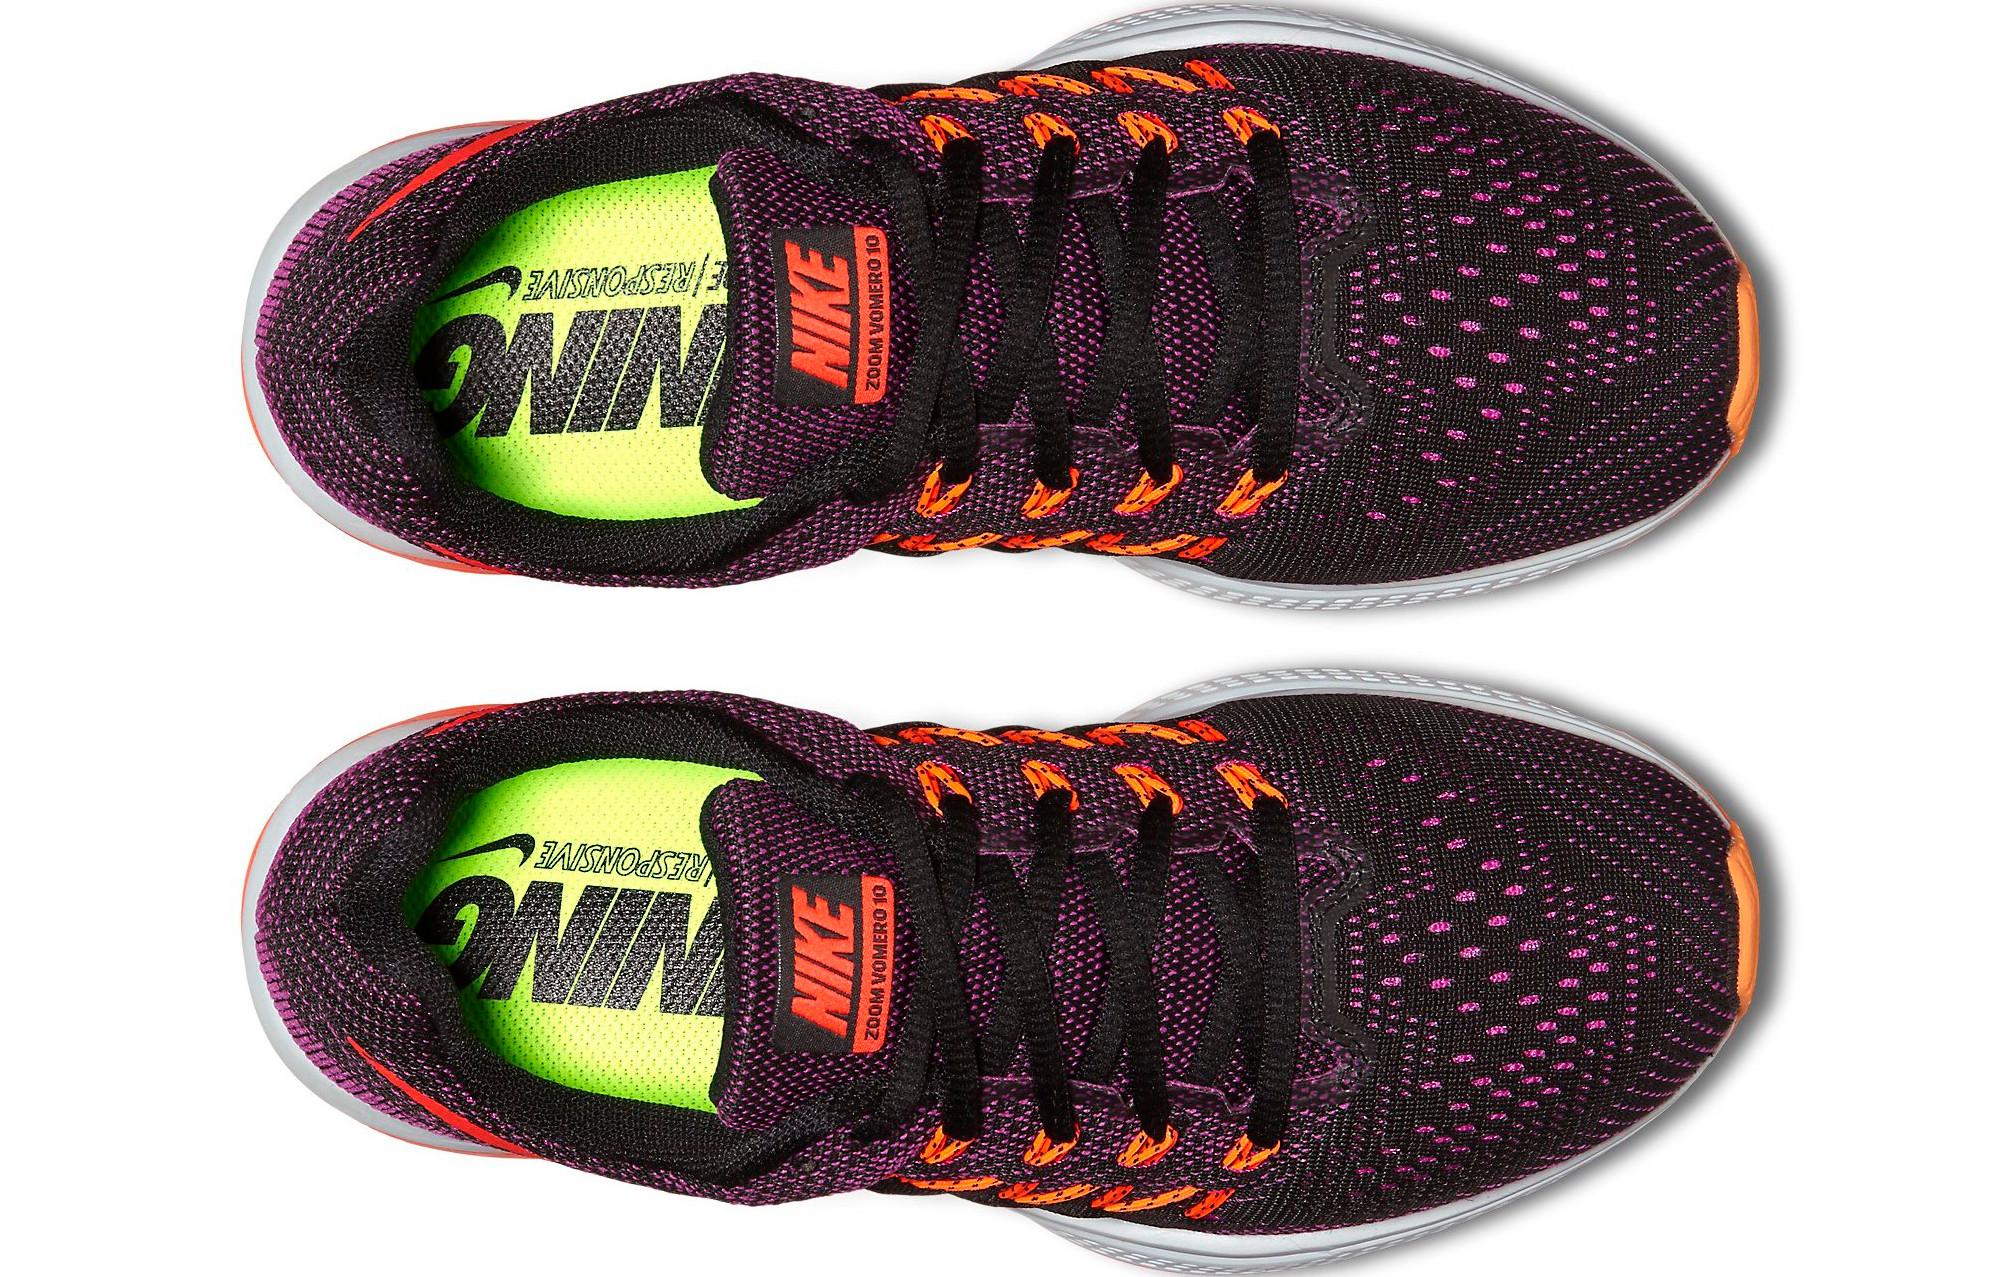 new products 780c7 4b241 Chaussures de Running Femme Nike AIR ZOOM VOMERO 10 Violet   Noir   Orange